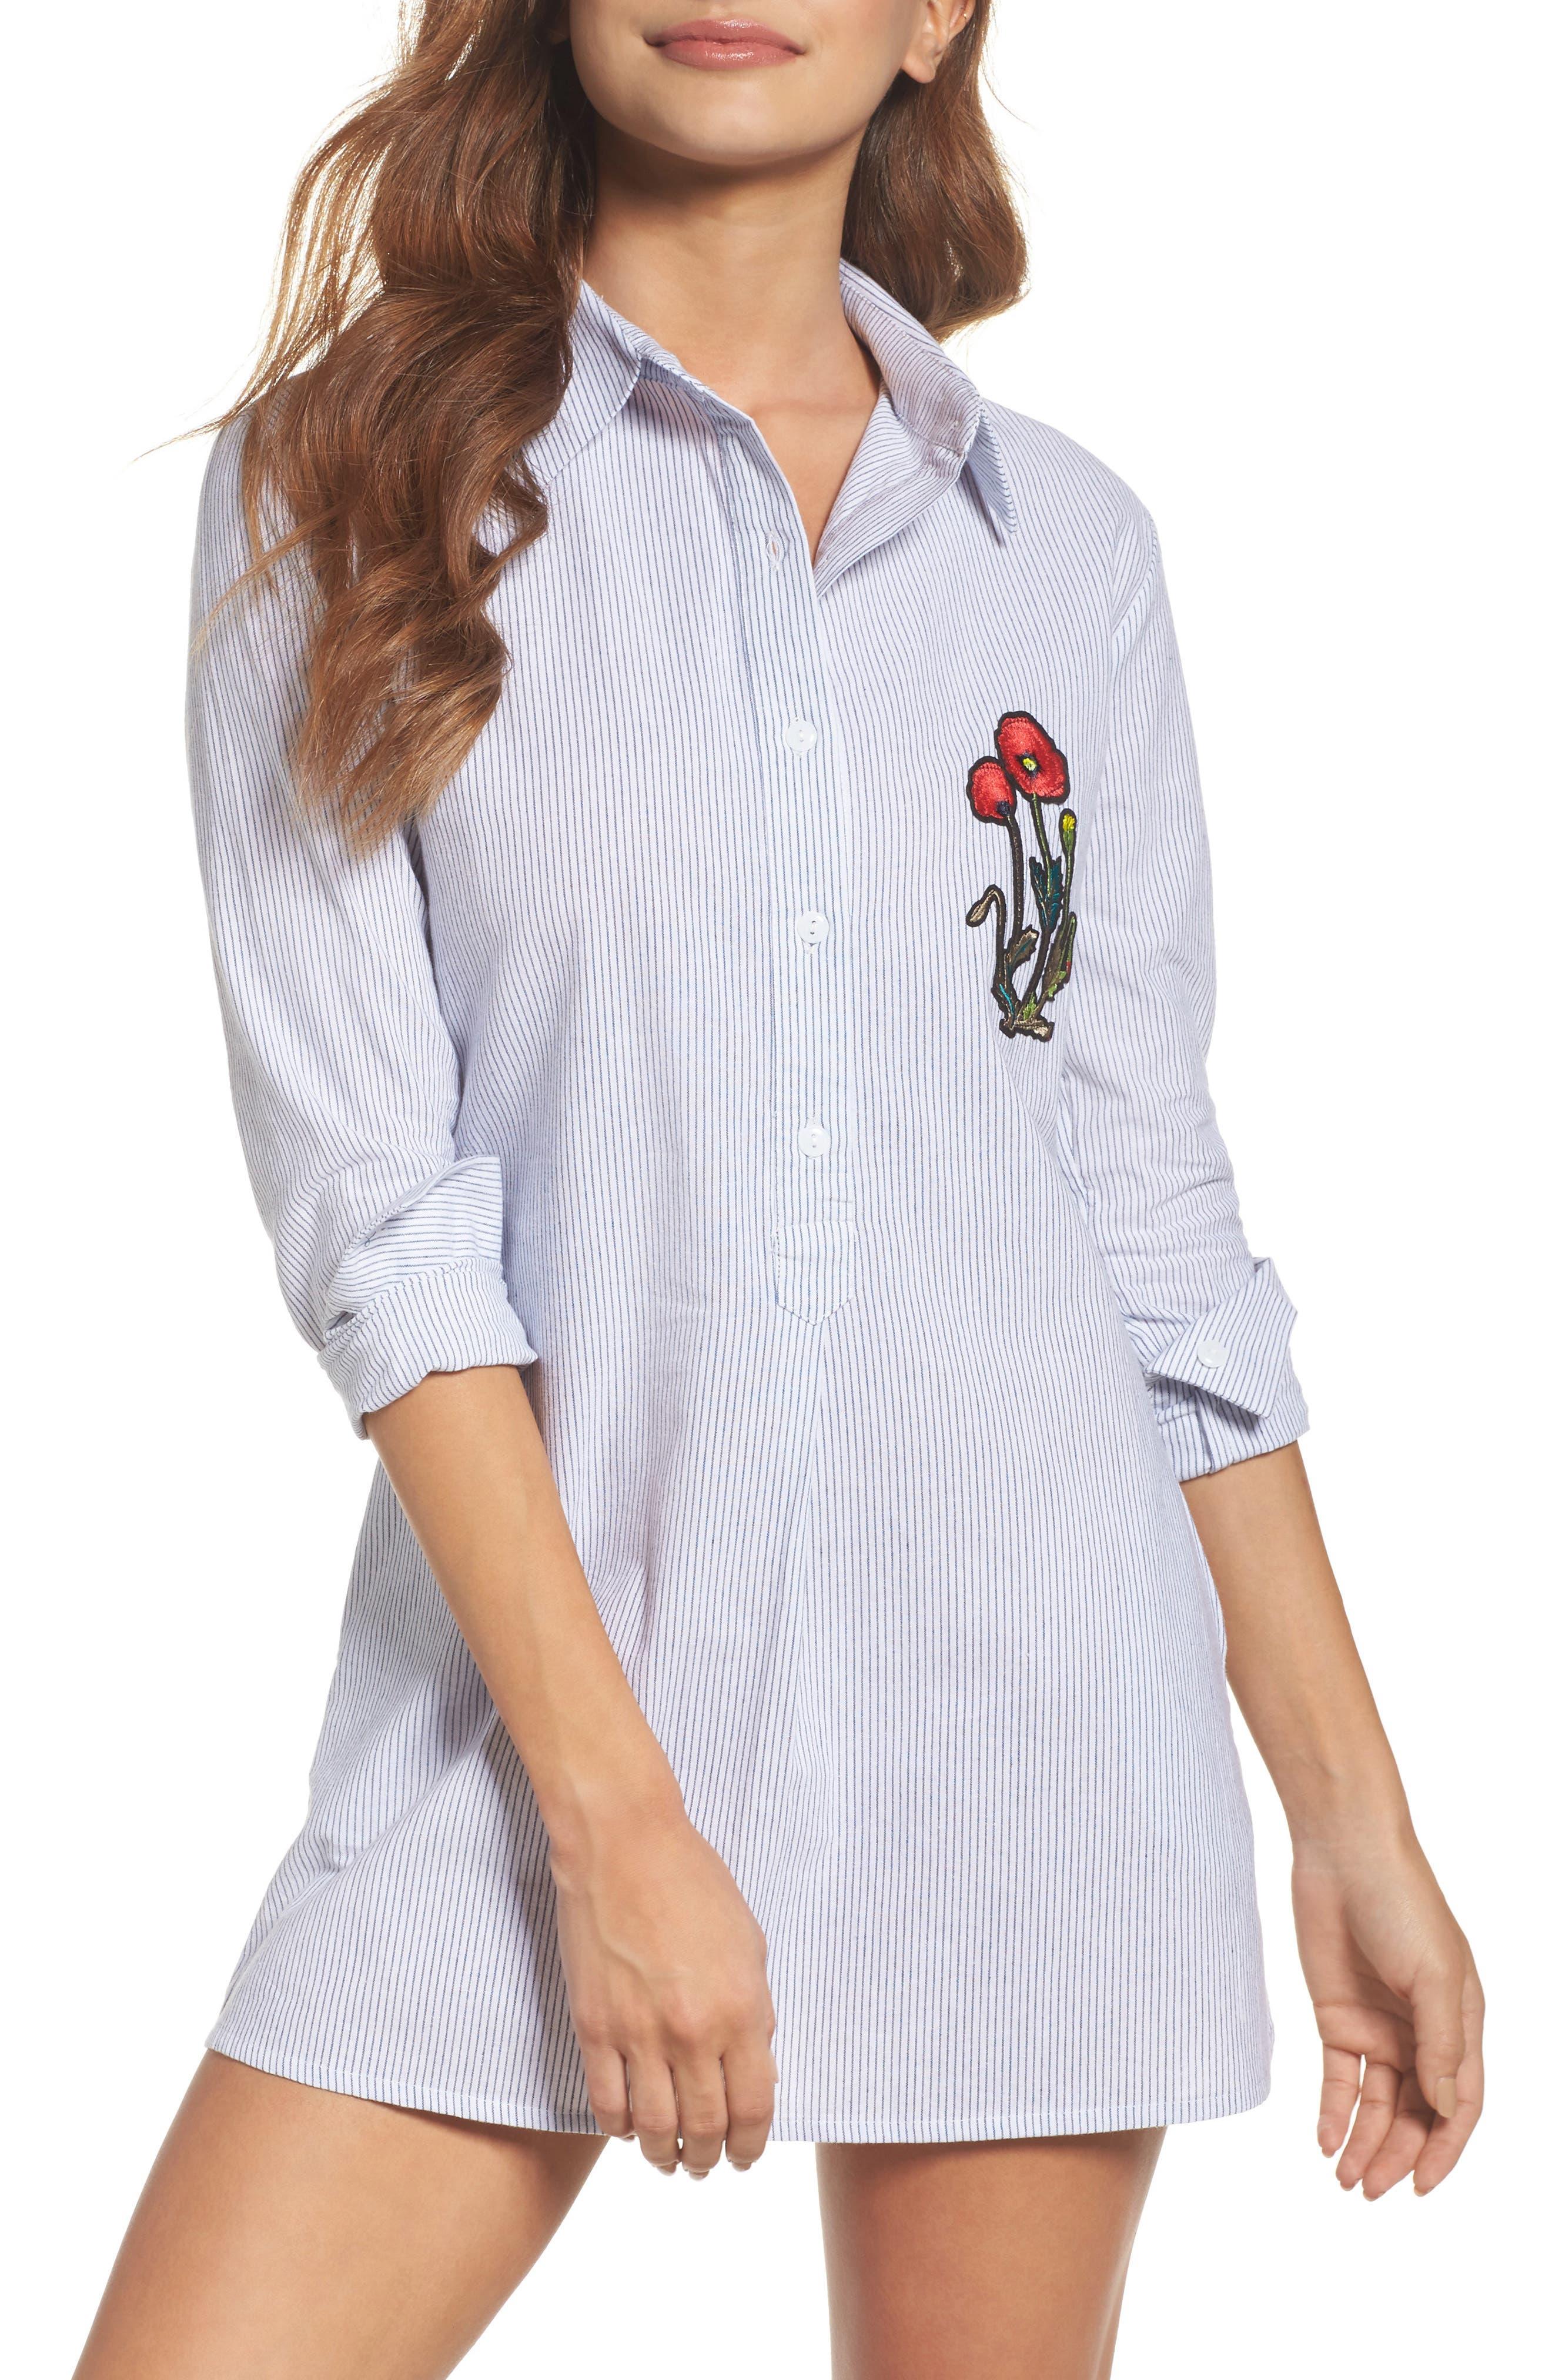 Embroidered Sleep Shirt,                             Main thumbnail 1, color,                             400